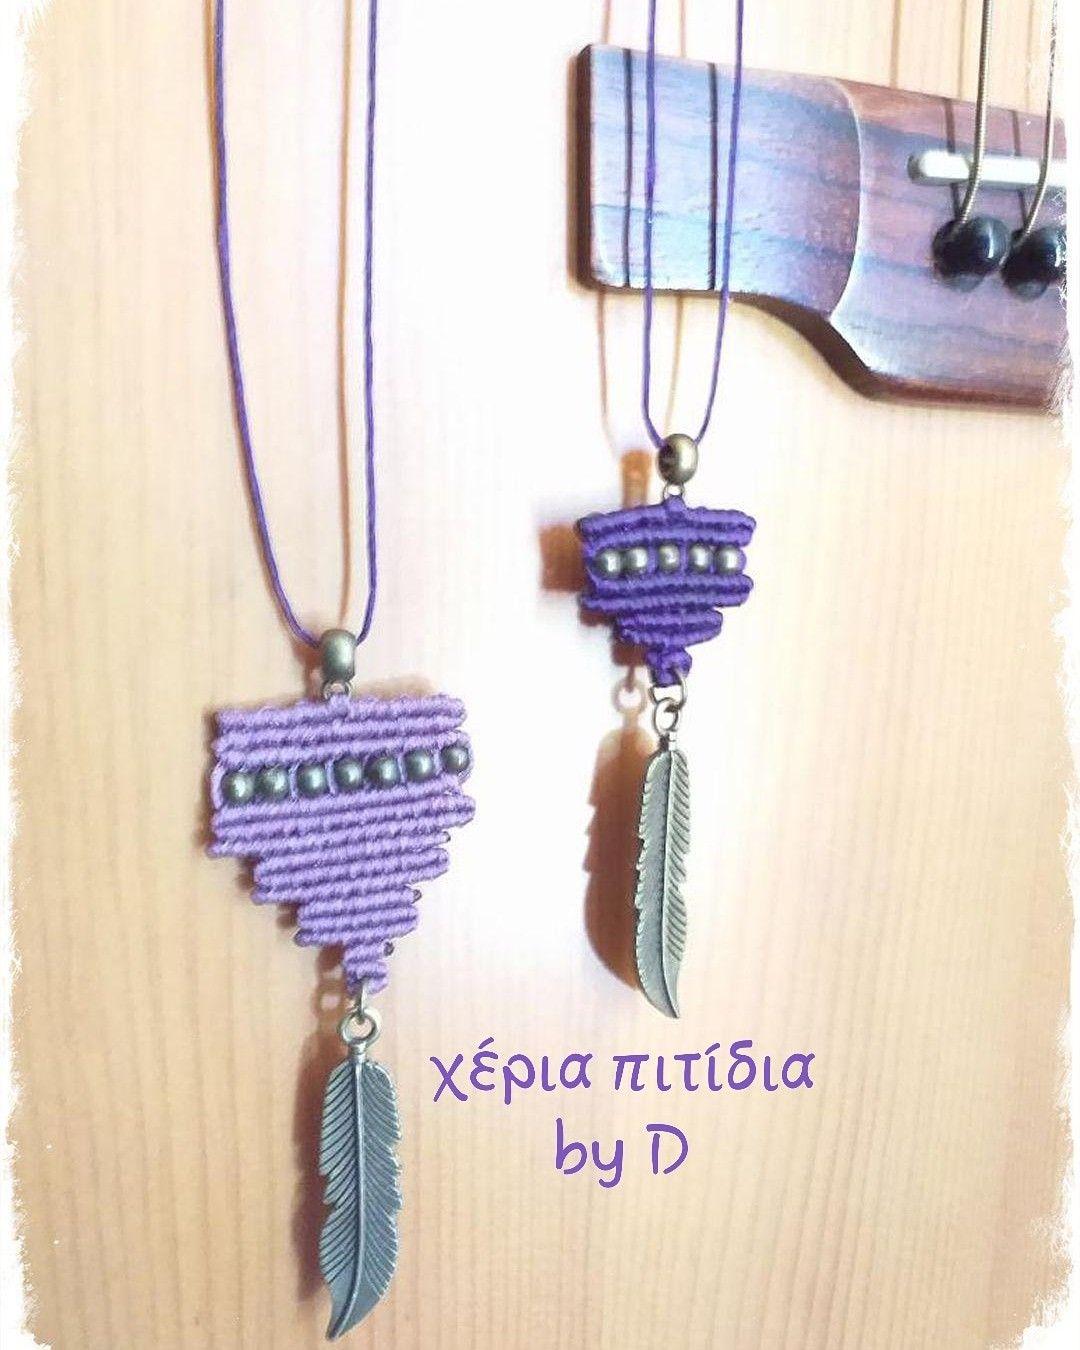 Lavender shades Macrame necklaces. #χέριαπιτίδια #heriapitidia #macrame #μακραμέ #macramenecklace #μακραμεκολιε #necklaces #κολιέ #giftideas #χειροποίηταδώρα #handmadegifts #gift #ιδέεςδώρων #δώρα #crete #greece #lavender #purple #μωβ #λεβάντα #마크라메 #마크라메팔찌목걸이 #목걸이 #καλοκαίρι #summer #summerjewelery #καλοκαιρινακοσμηματα #classicsummerjewelry #여름